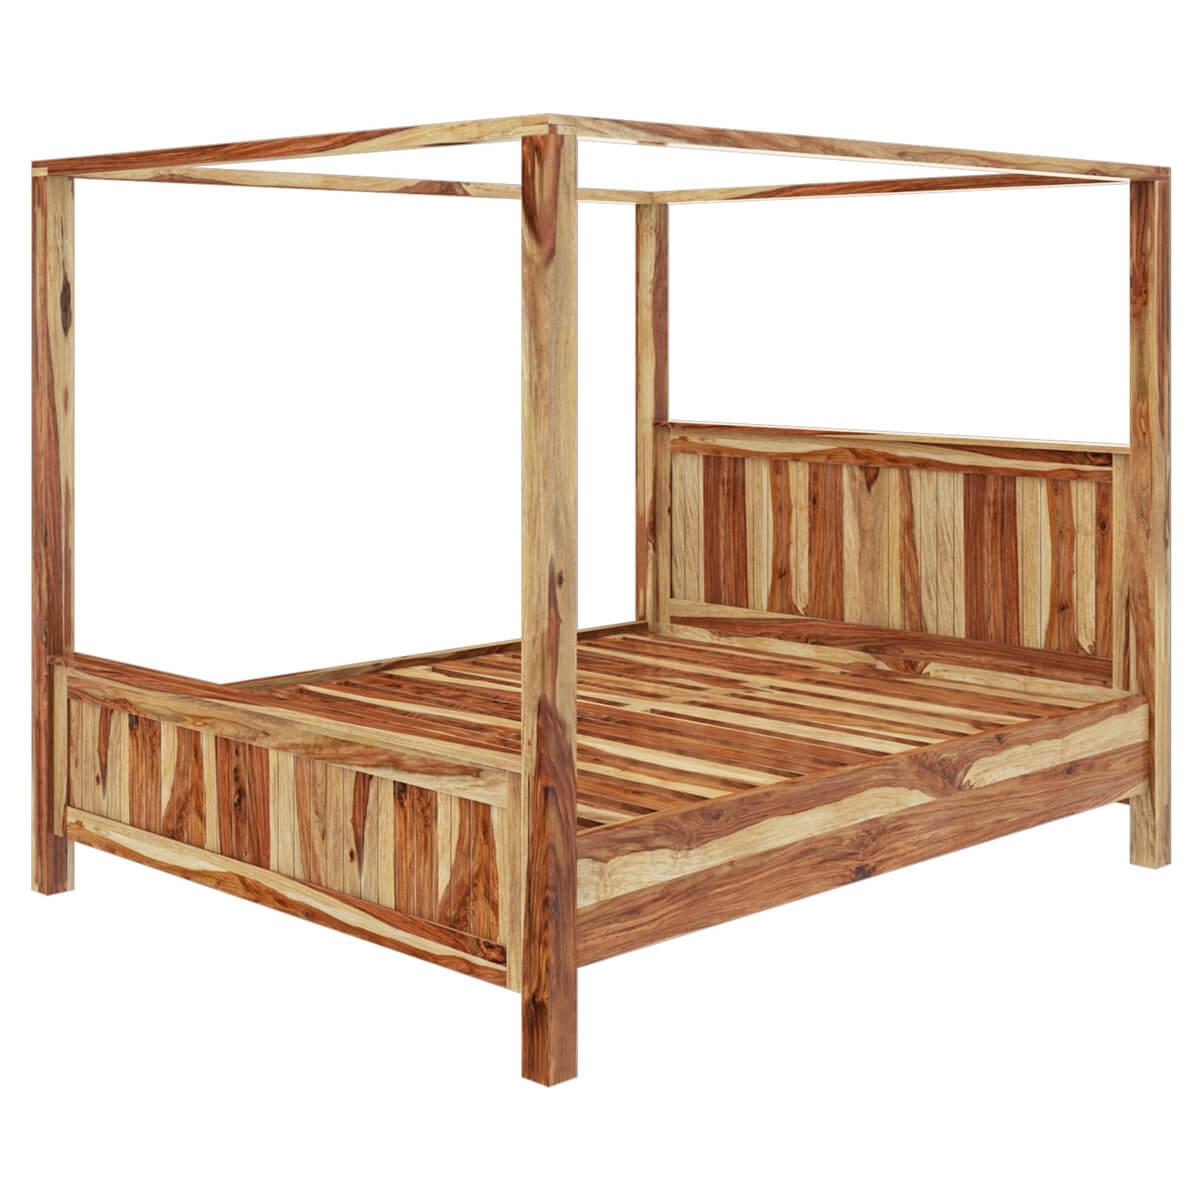 ff1accfa8f30e Larvik Rustic Solid Wood Platform Canopy Bed